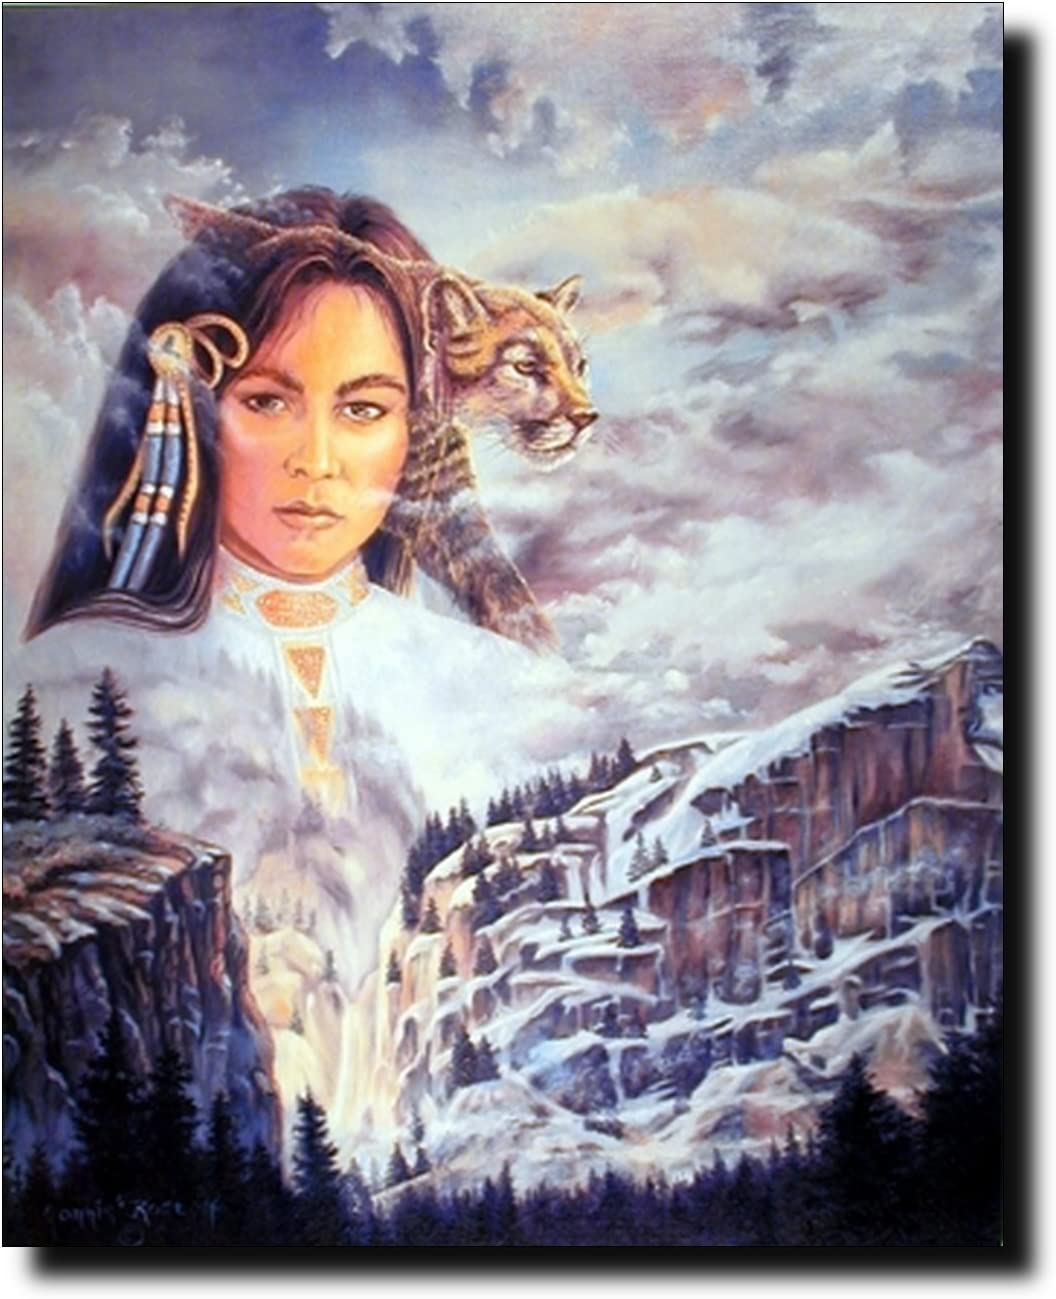 Native American Wall Decor Indian Princess and Mountain Lion Art Print Poster (16x20)